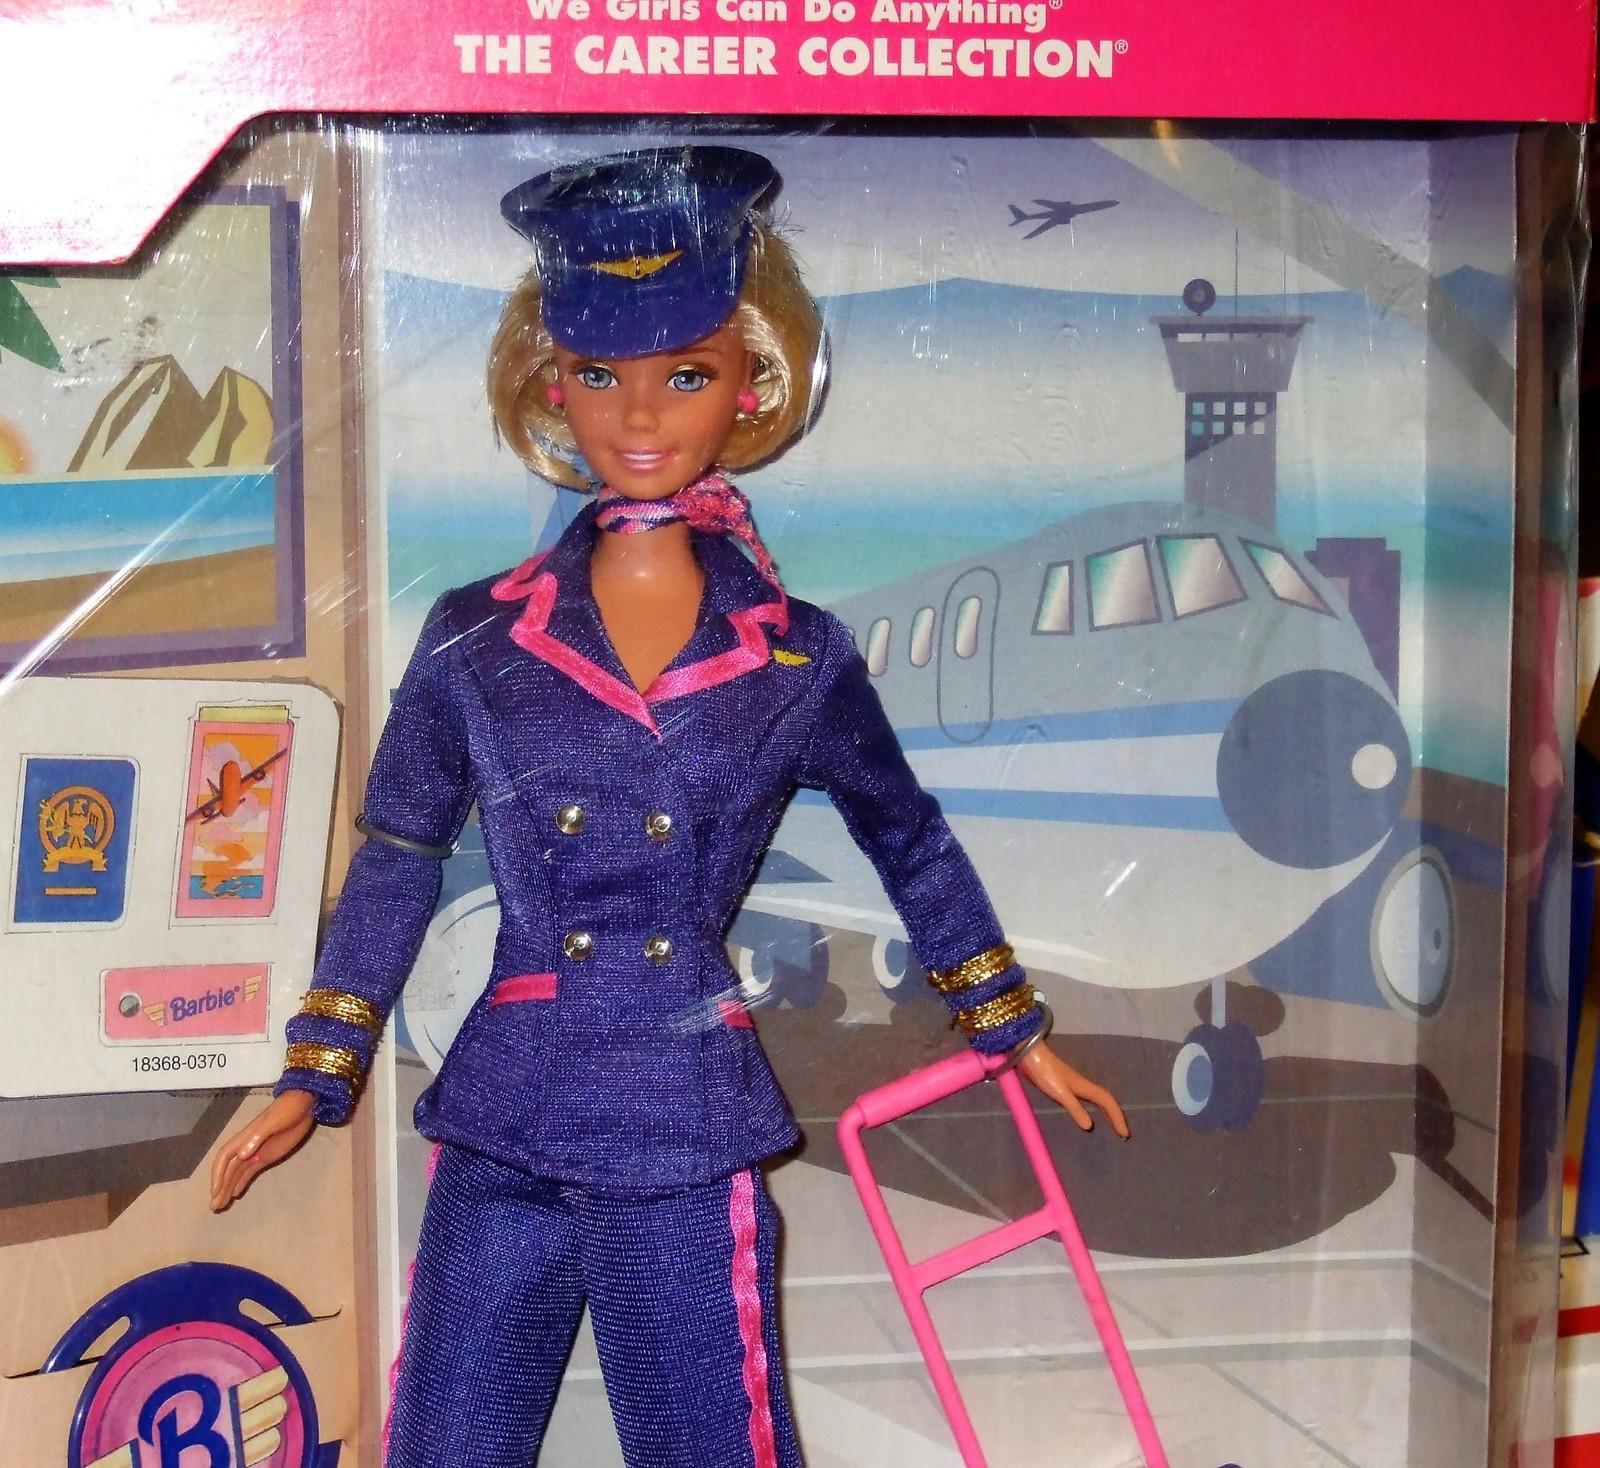 Barbie Doll - Pilot Barbie